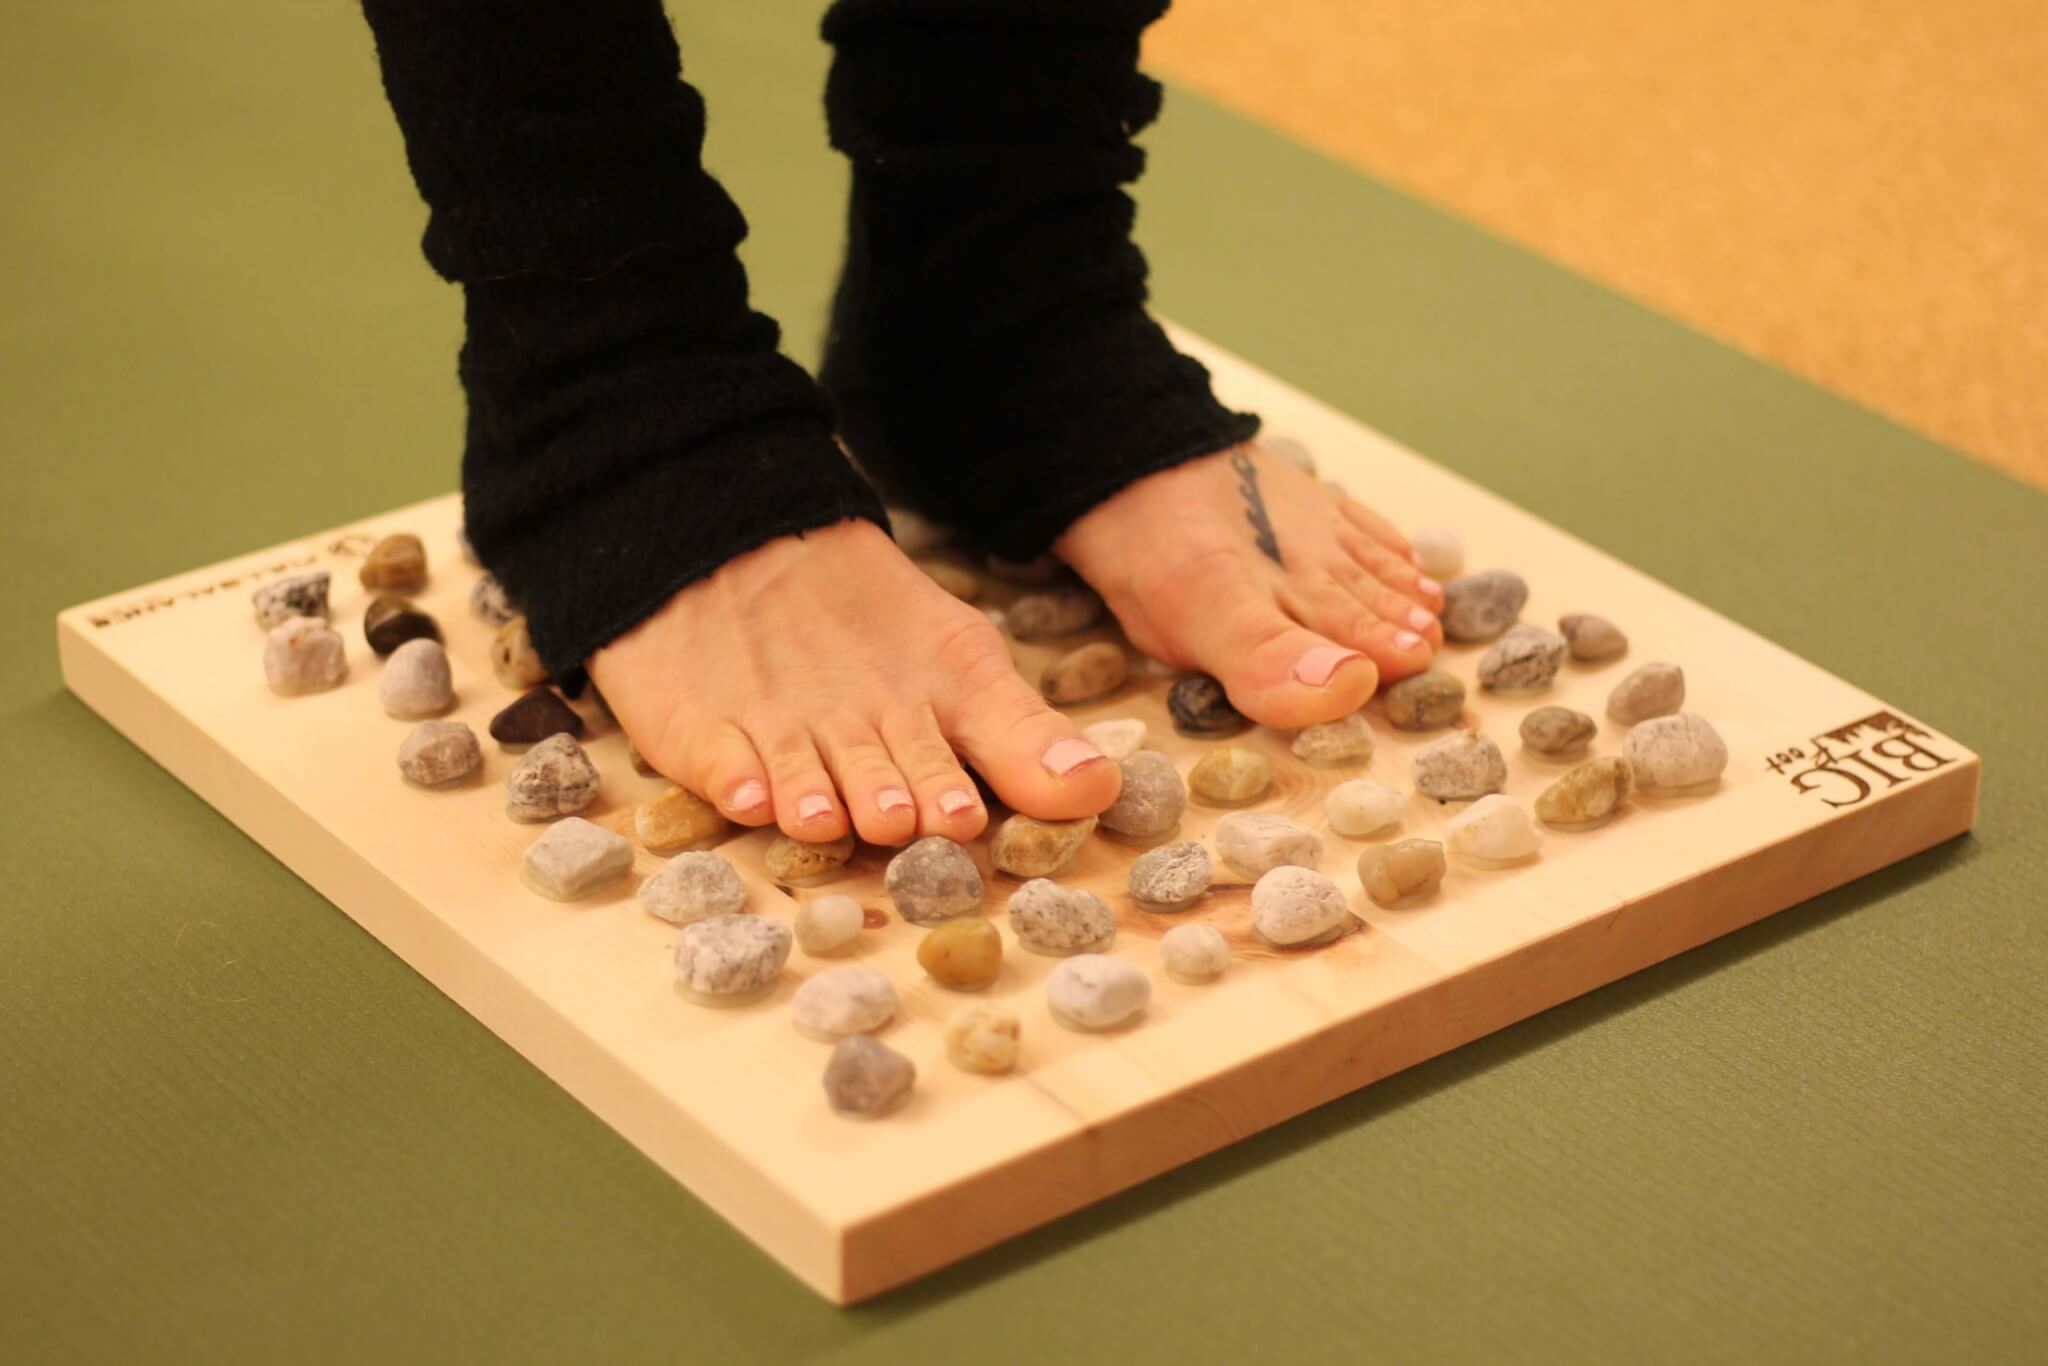 Fußreflexzonenmassage Brett Big Foot Natur Zirbe